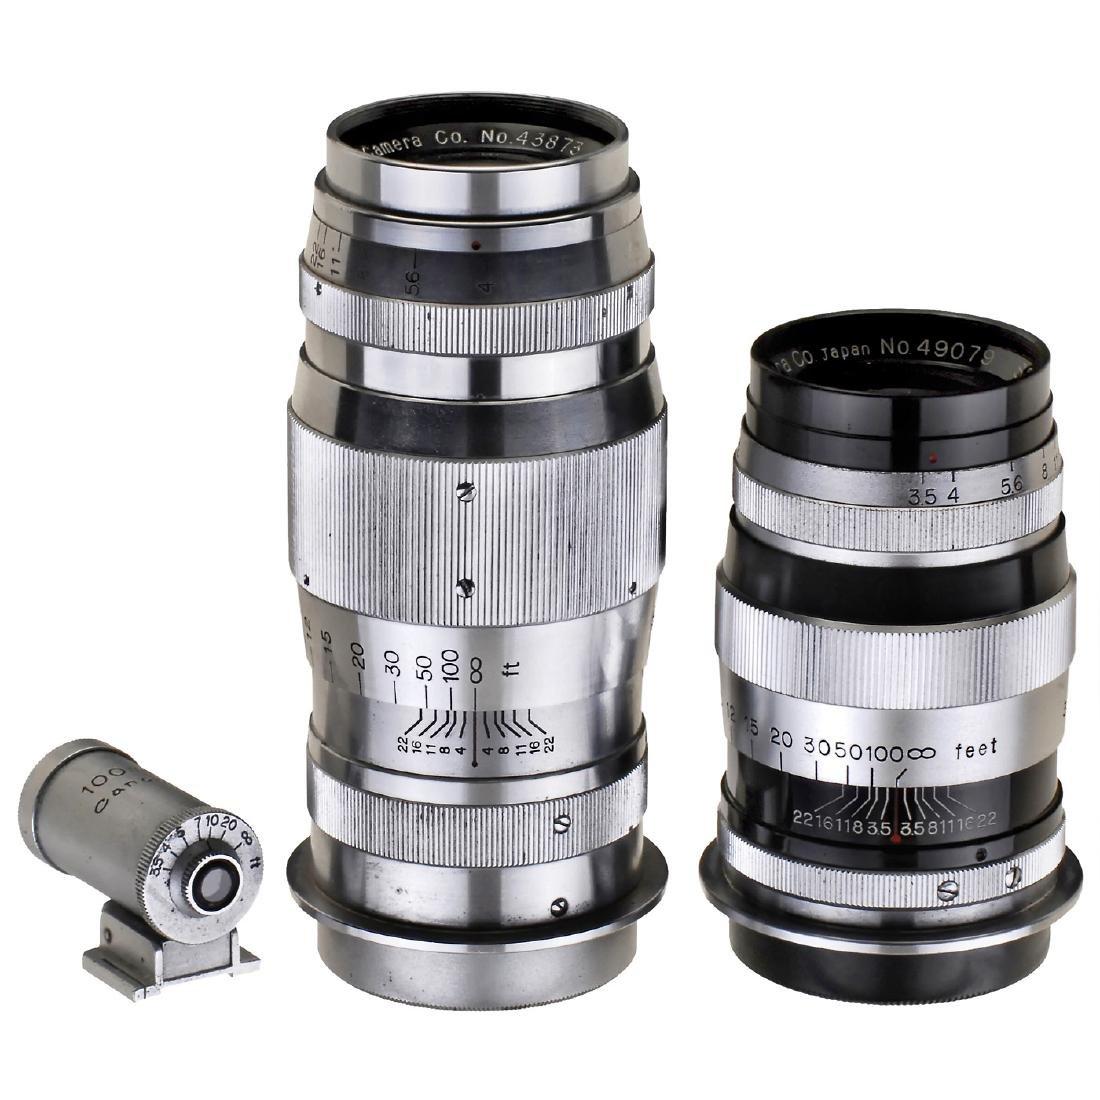 2 Canon Rangefinder Lenses